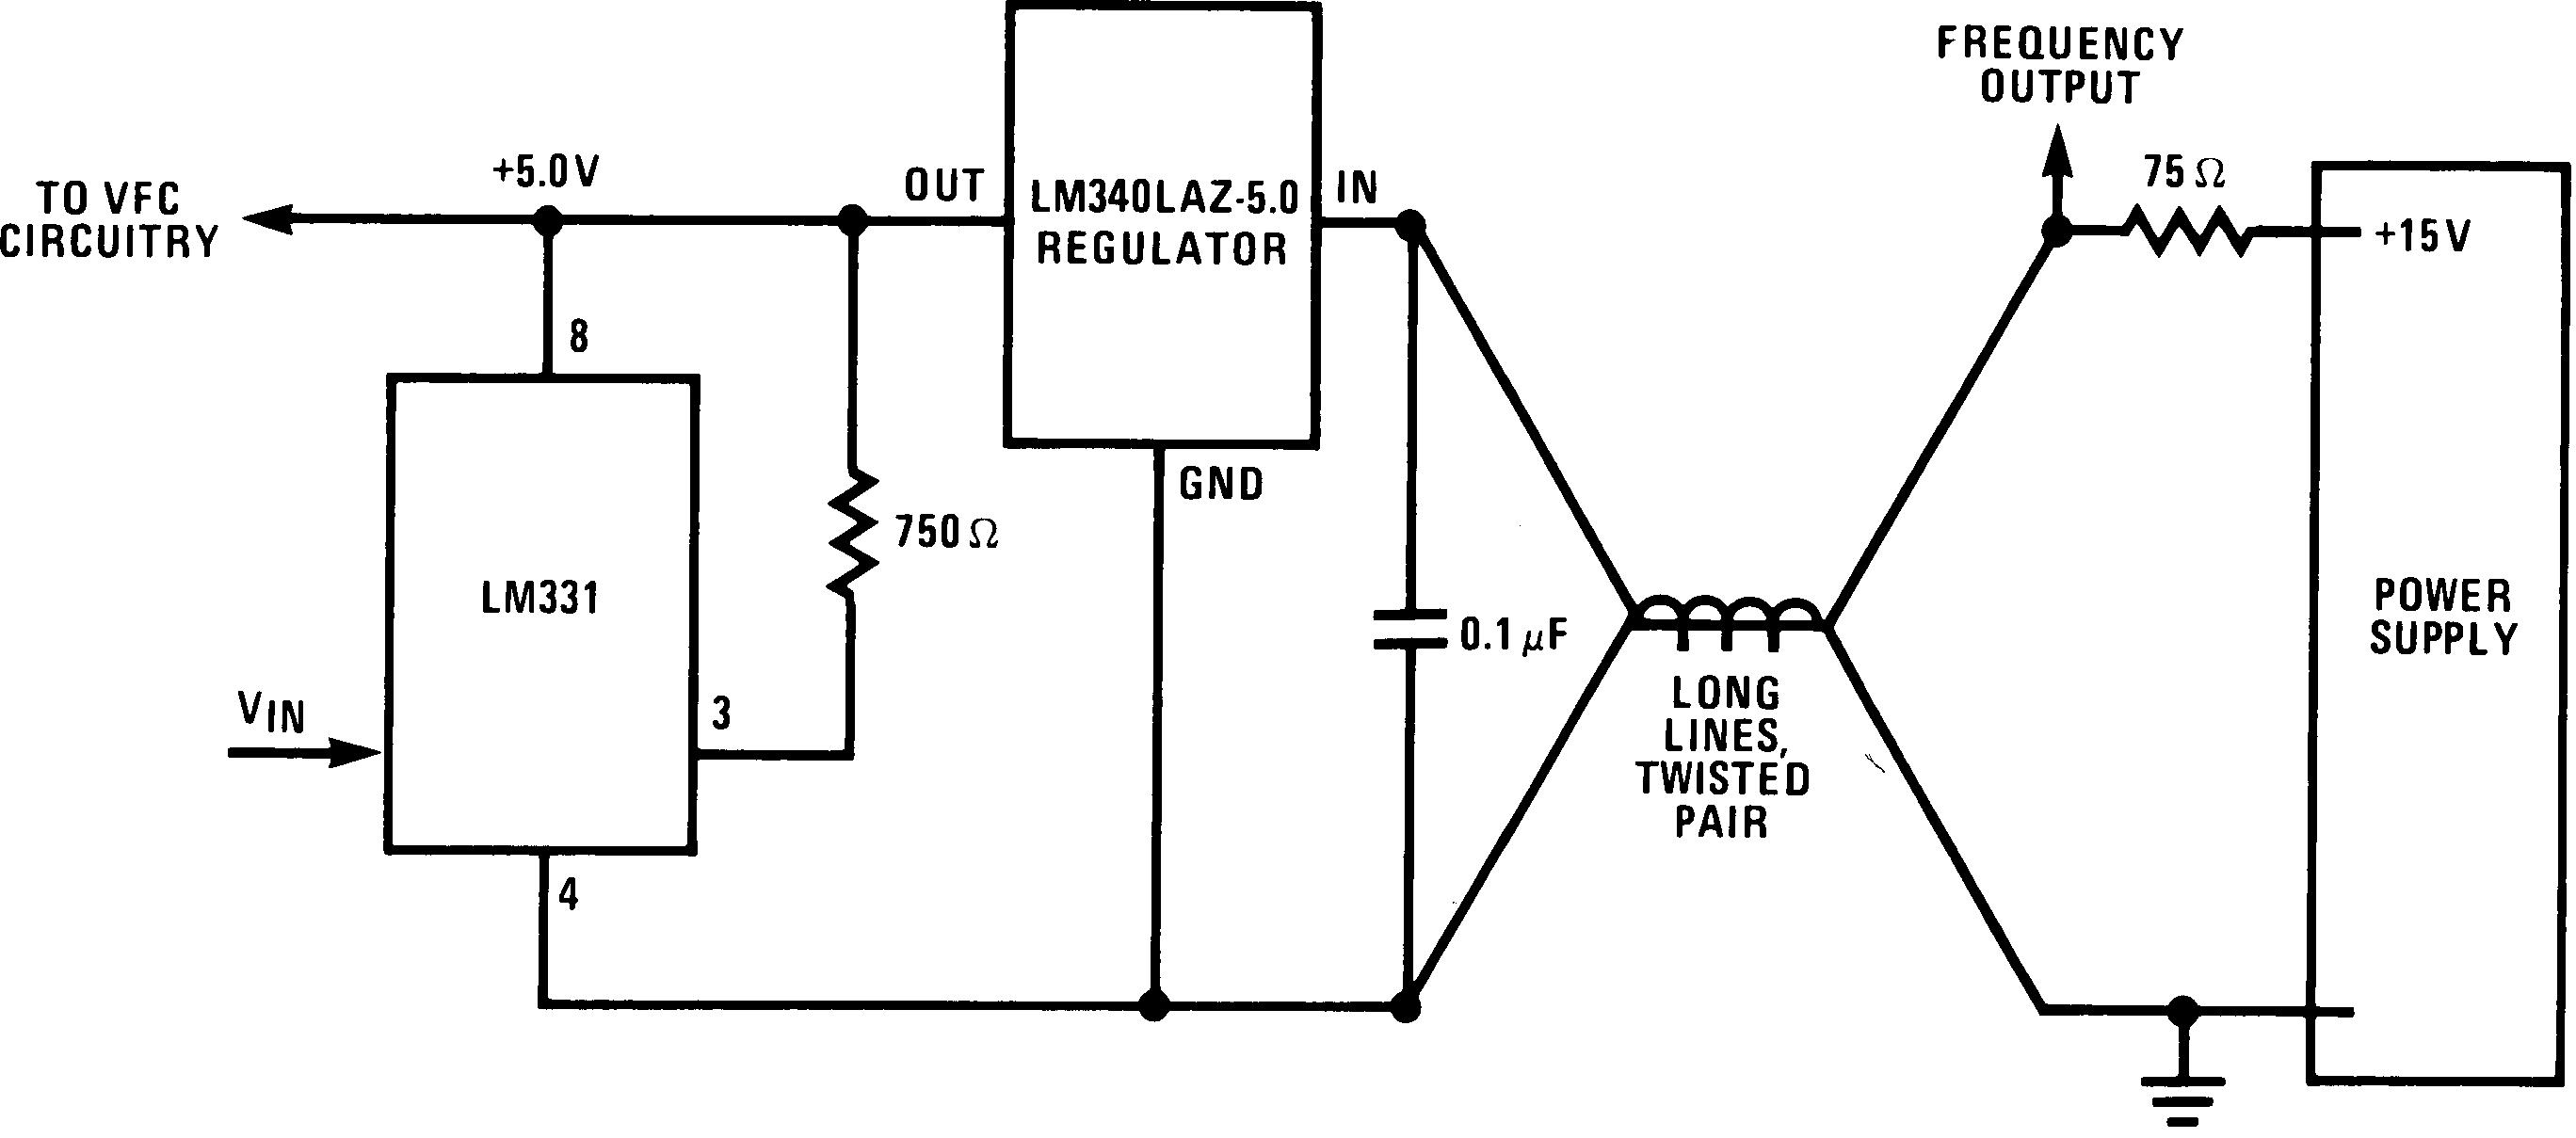 Frequency Converter Wiring Diagram Trusted Diagrams Basic Power Opamp Voltage Regulator Circuit Tradeoficcom Lm231 Tij Co Jp 50 Amp Rv